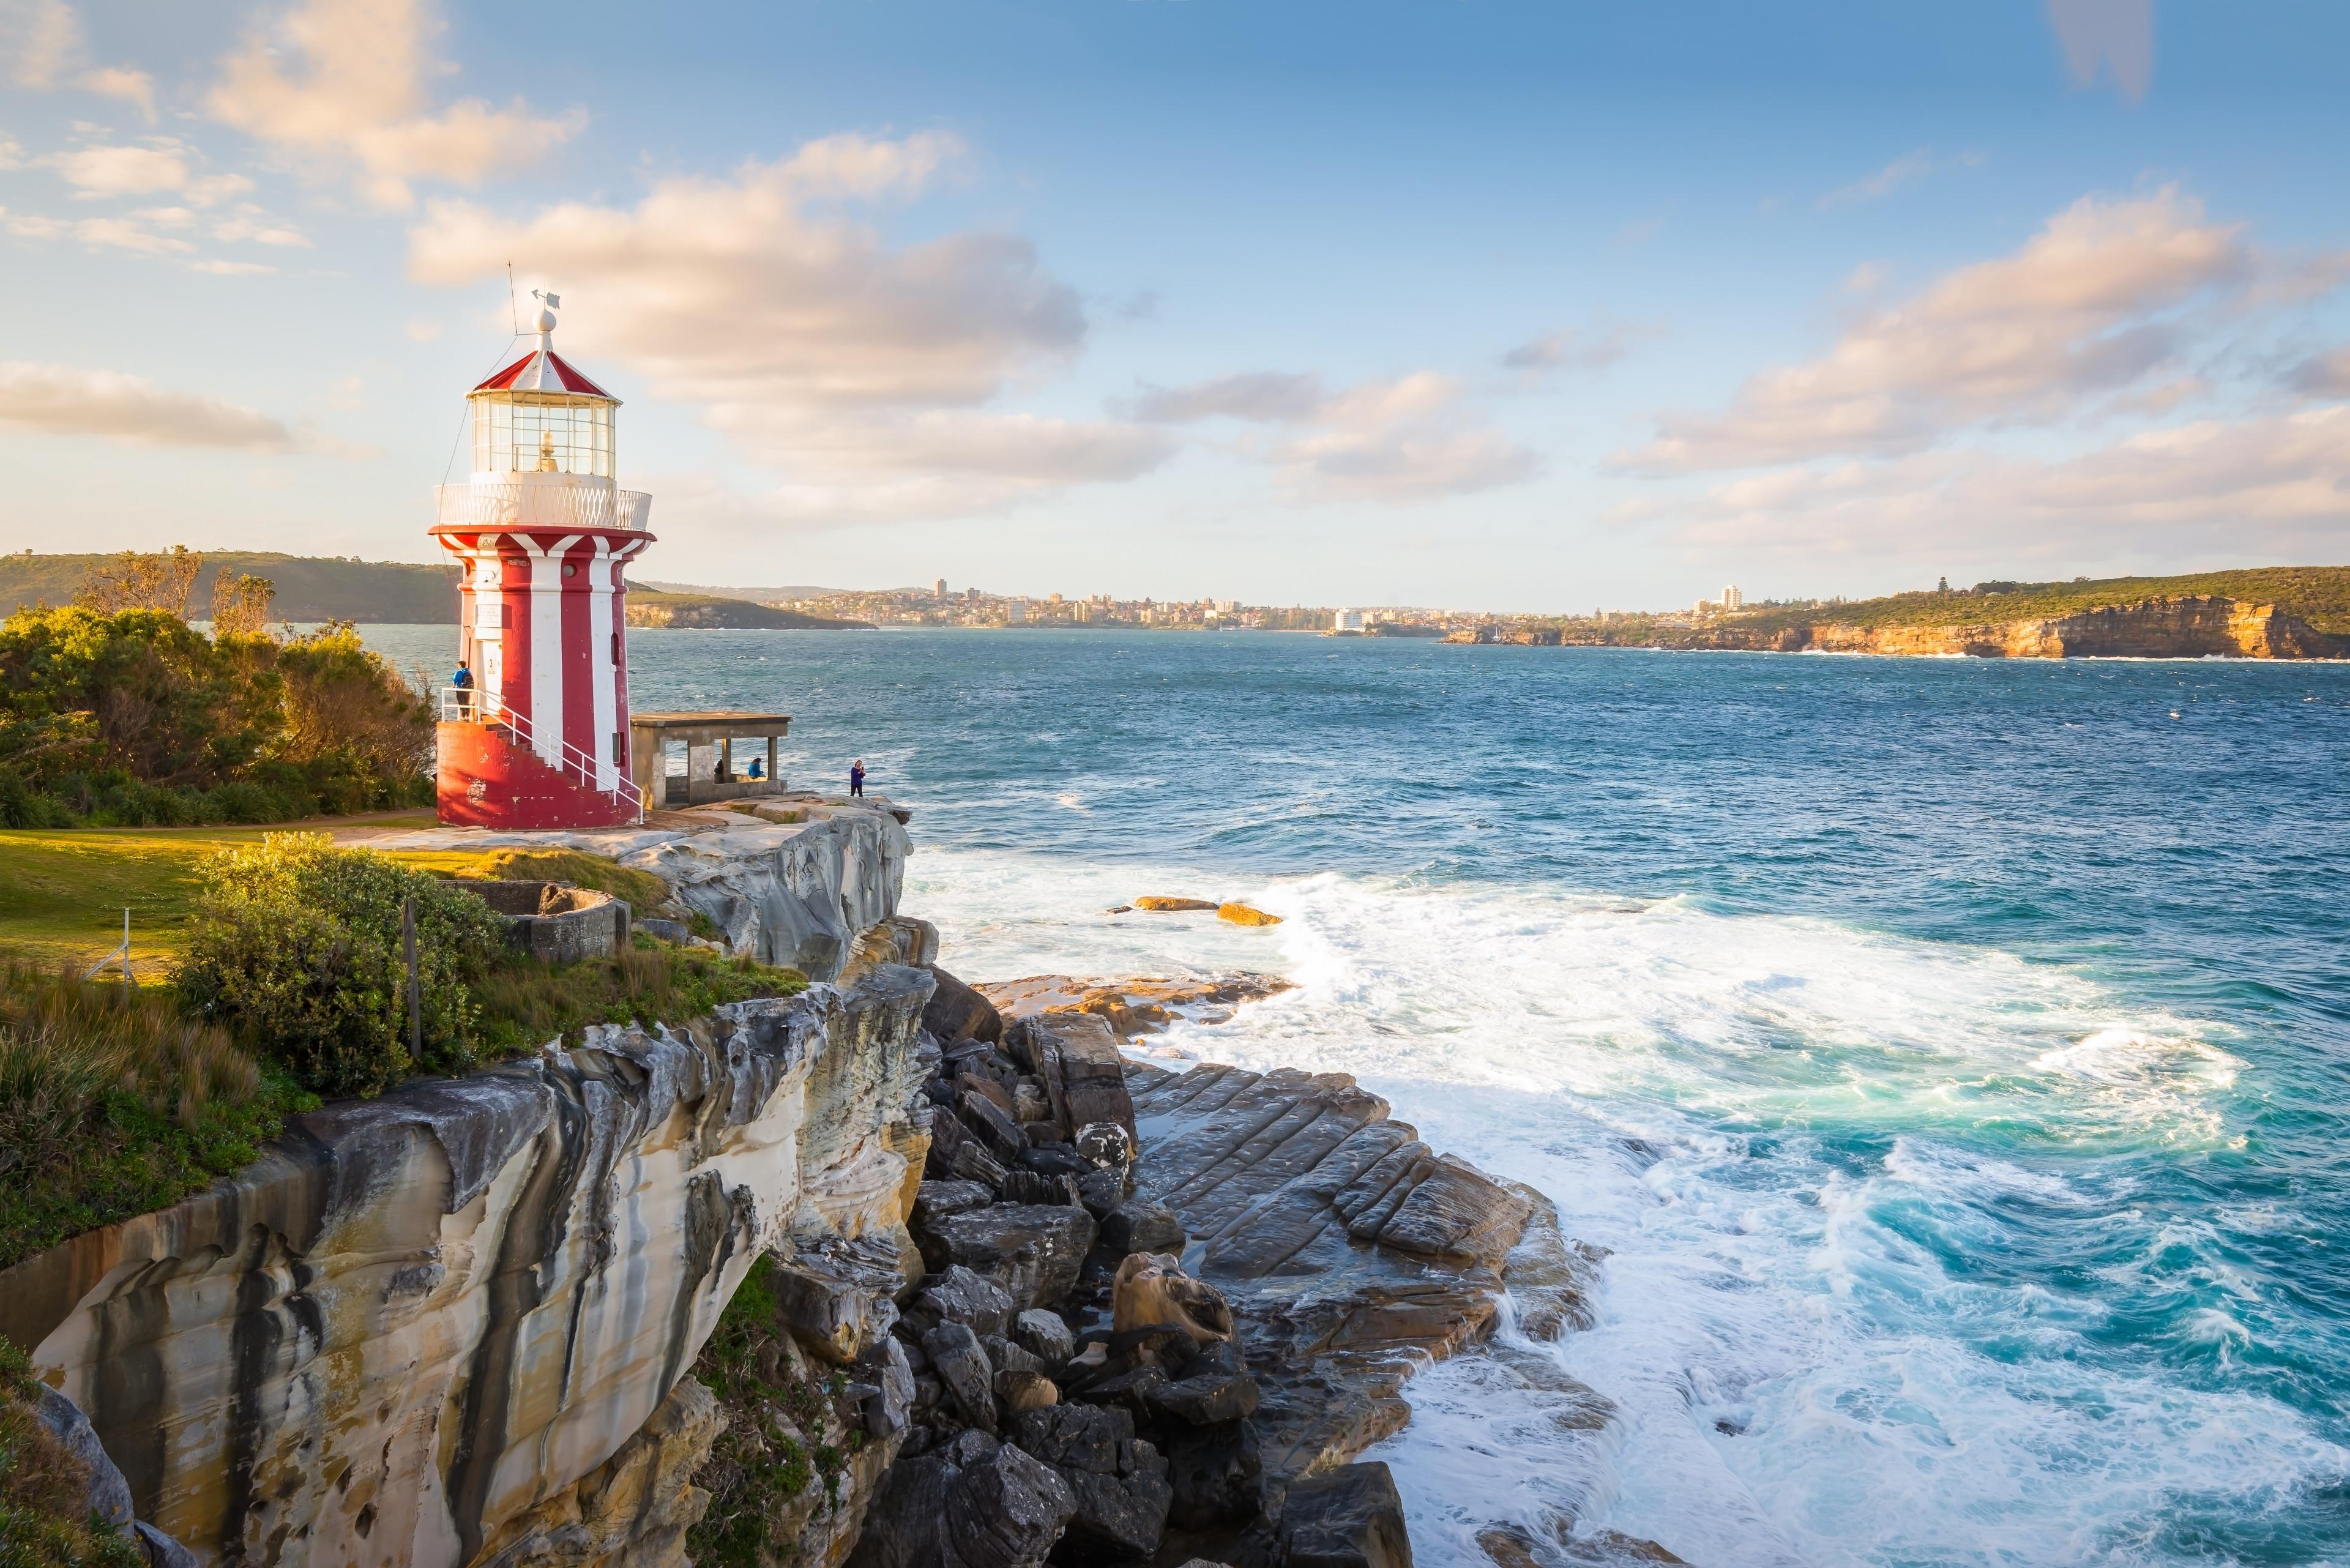 Sydney Harbour National Park, Sydney, New South Wales, Australien